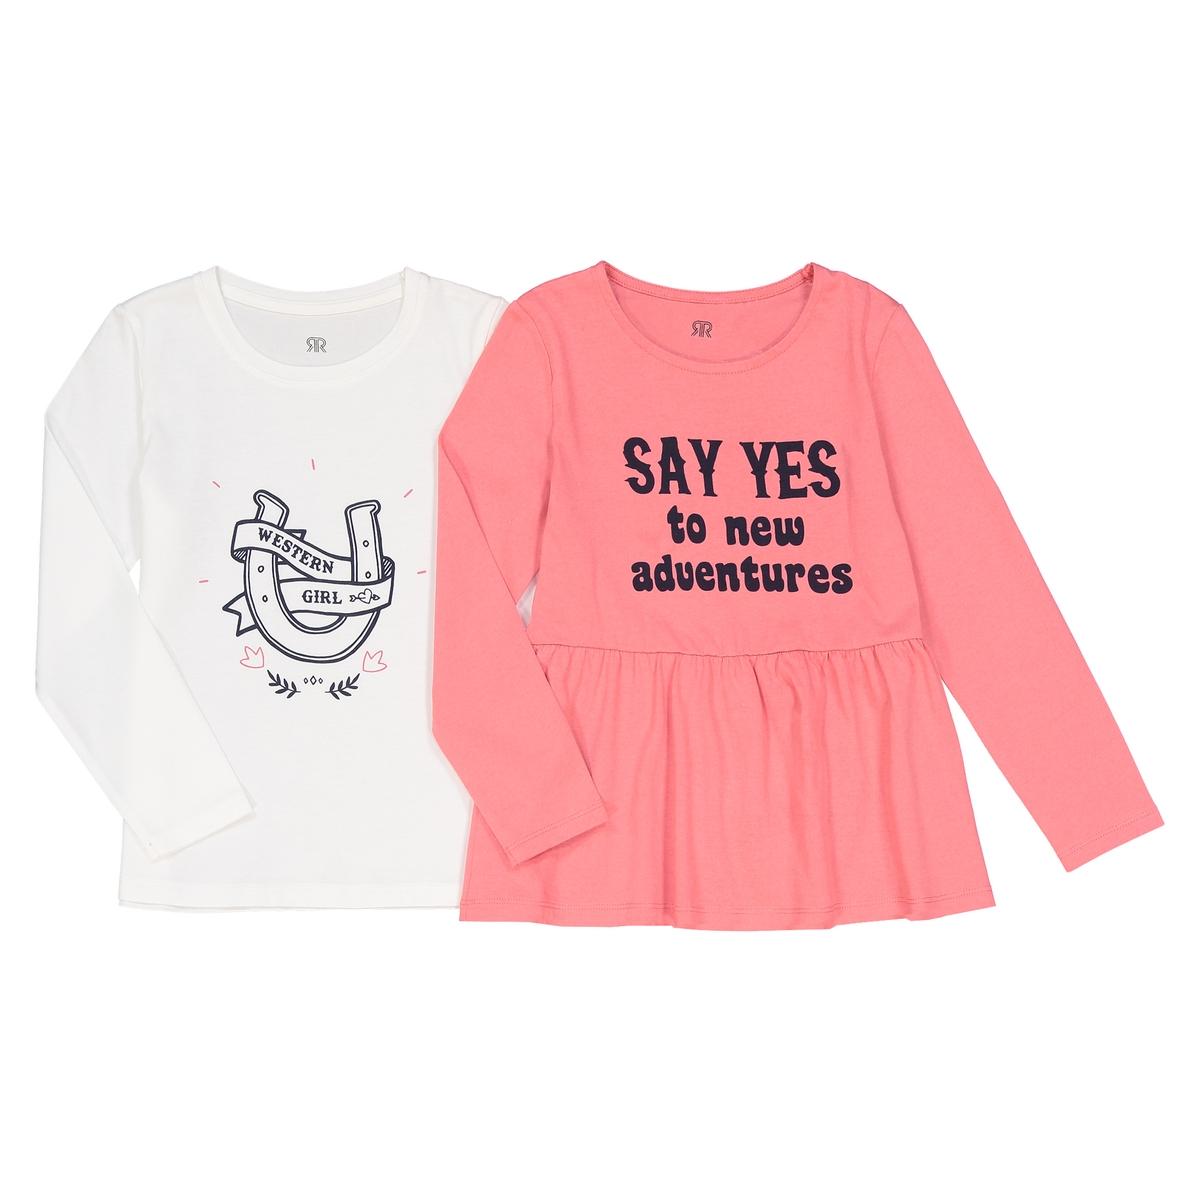 Confezione da 2 t-shirt maniche lunghe 3 - 12 anni